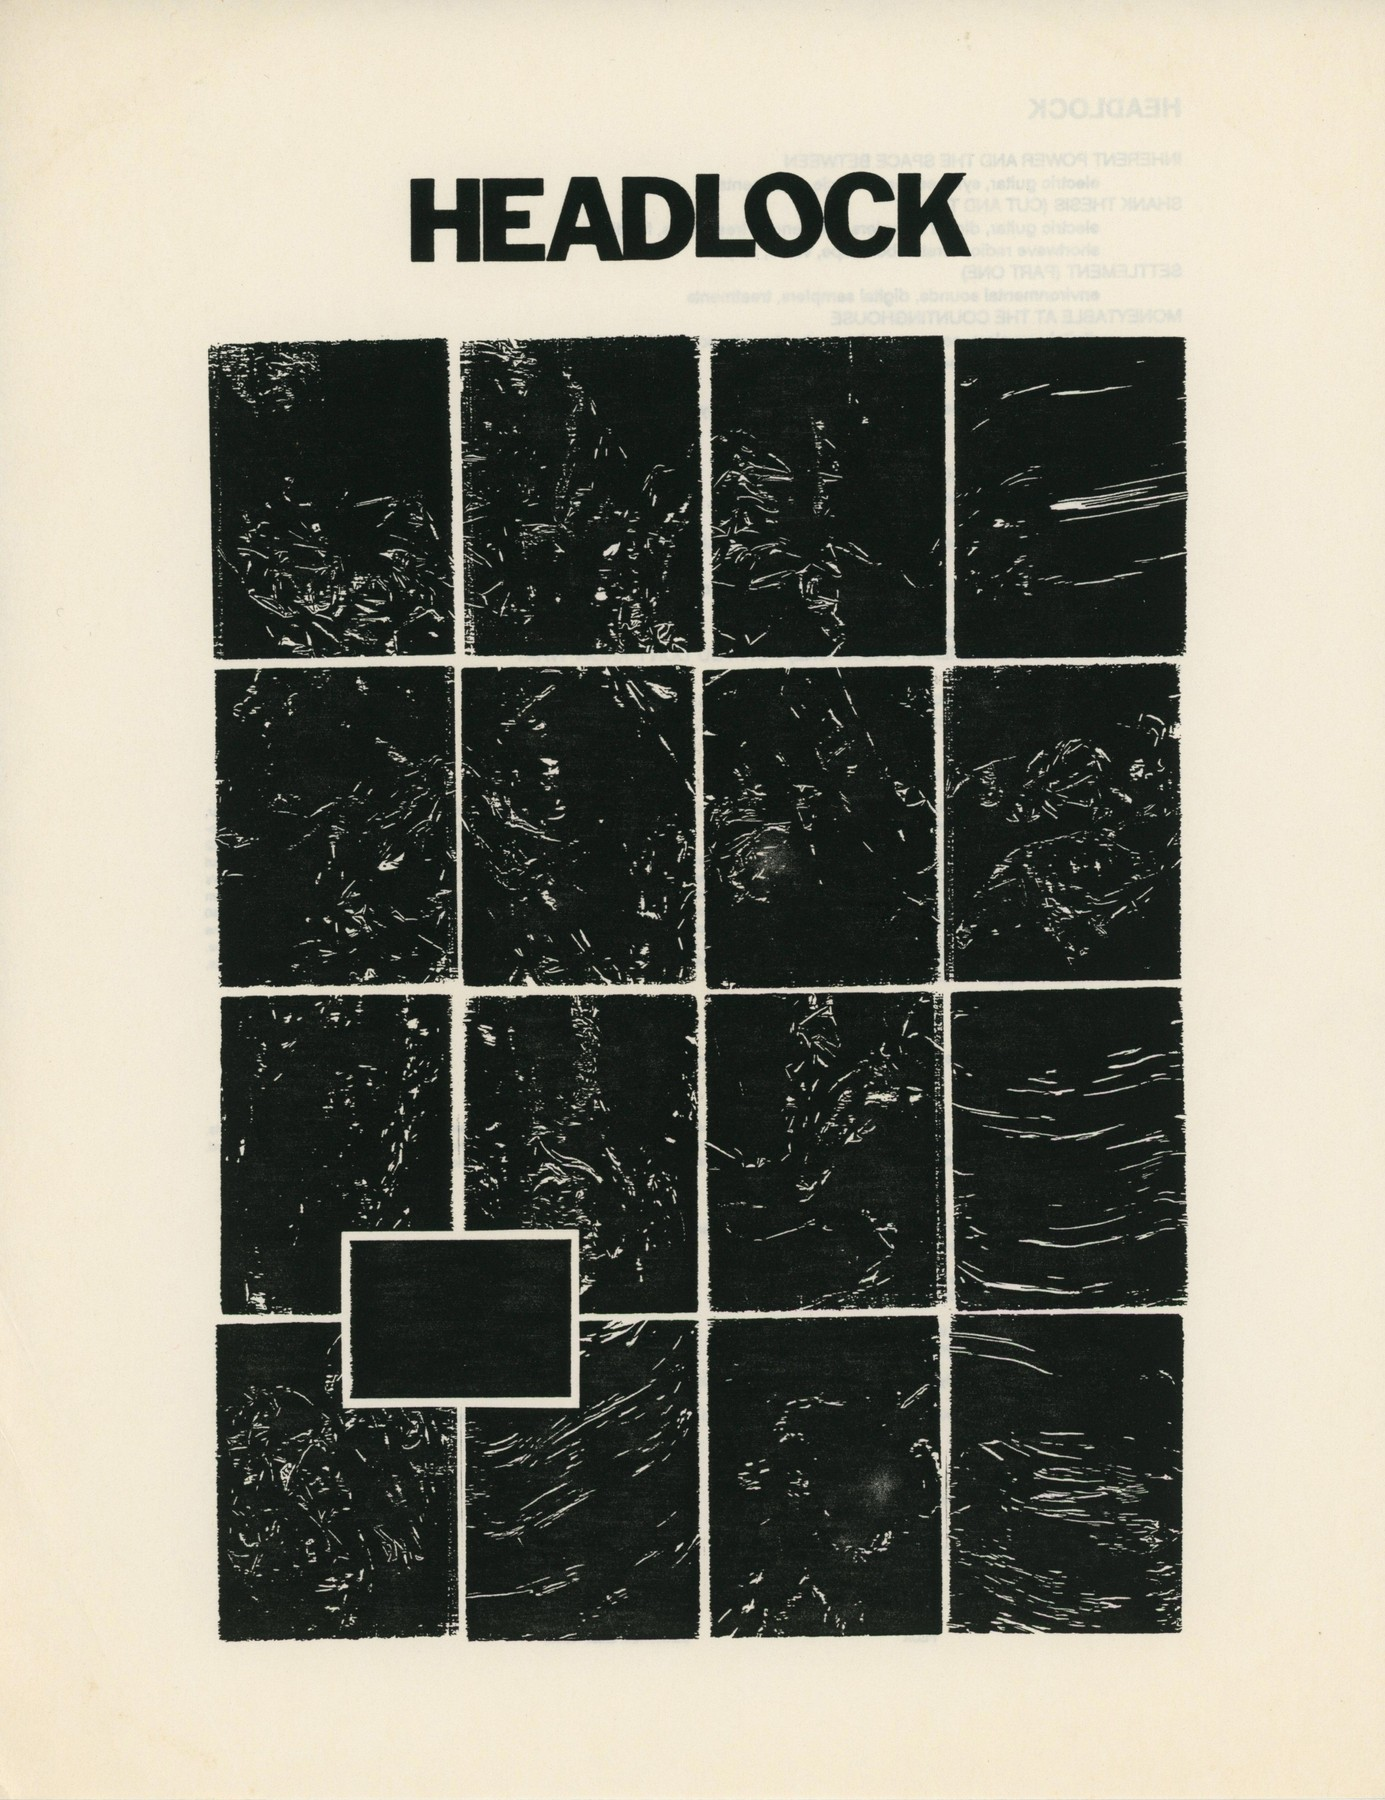 Thomas Dimuzio - Headlock LP Insert 1